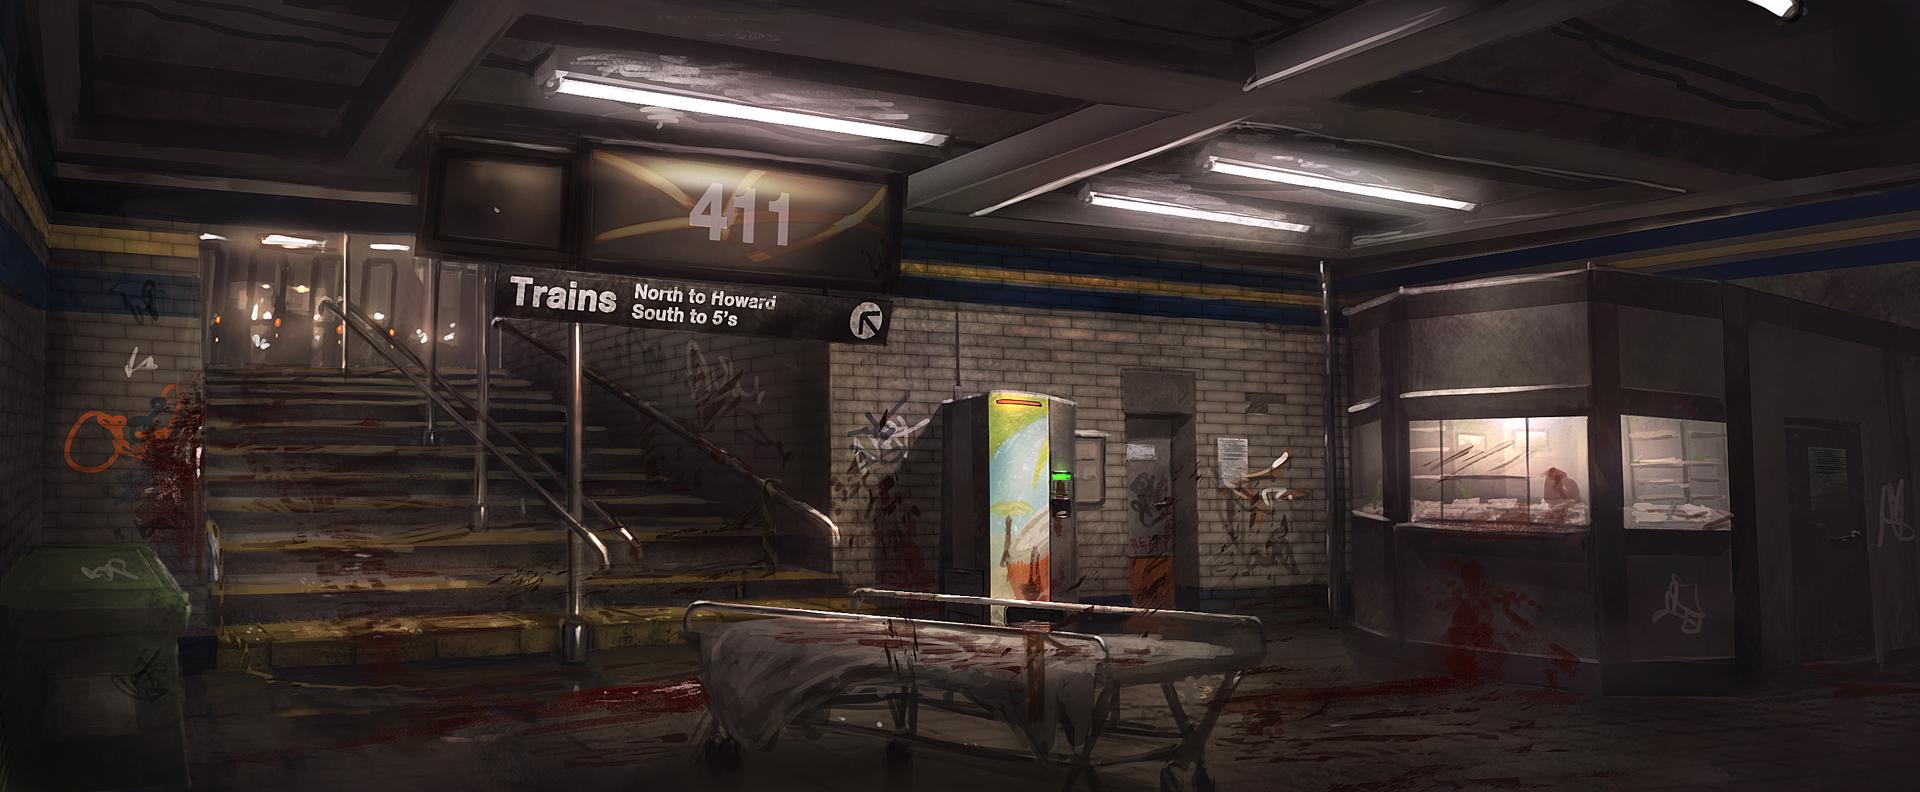 Premade Kitchen Island Subway Concept Art By Yellomice On Deviantart